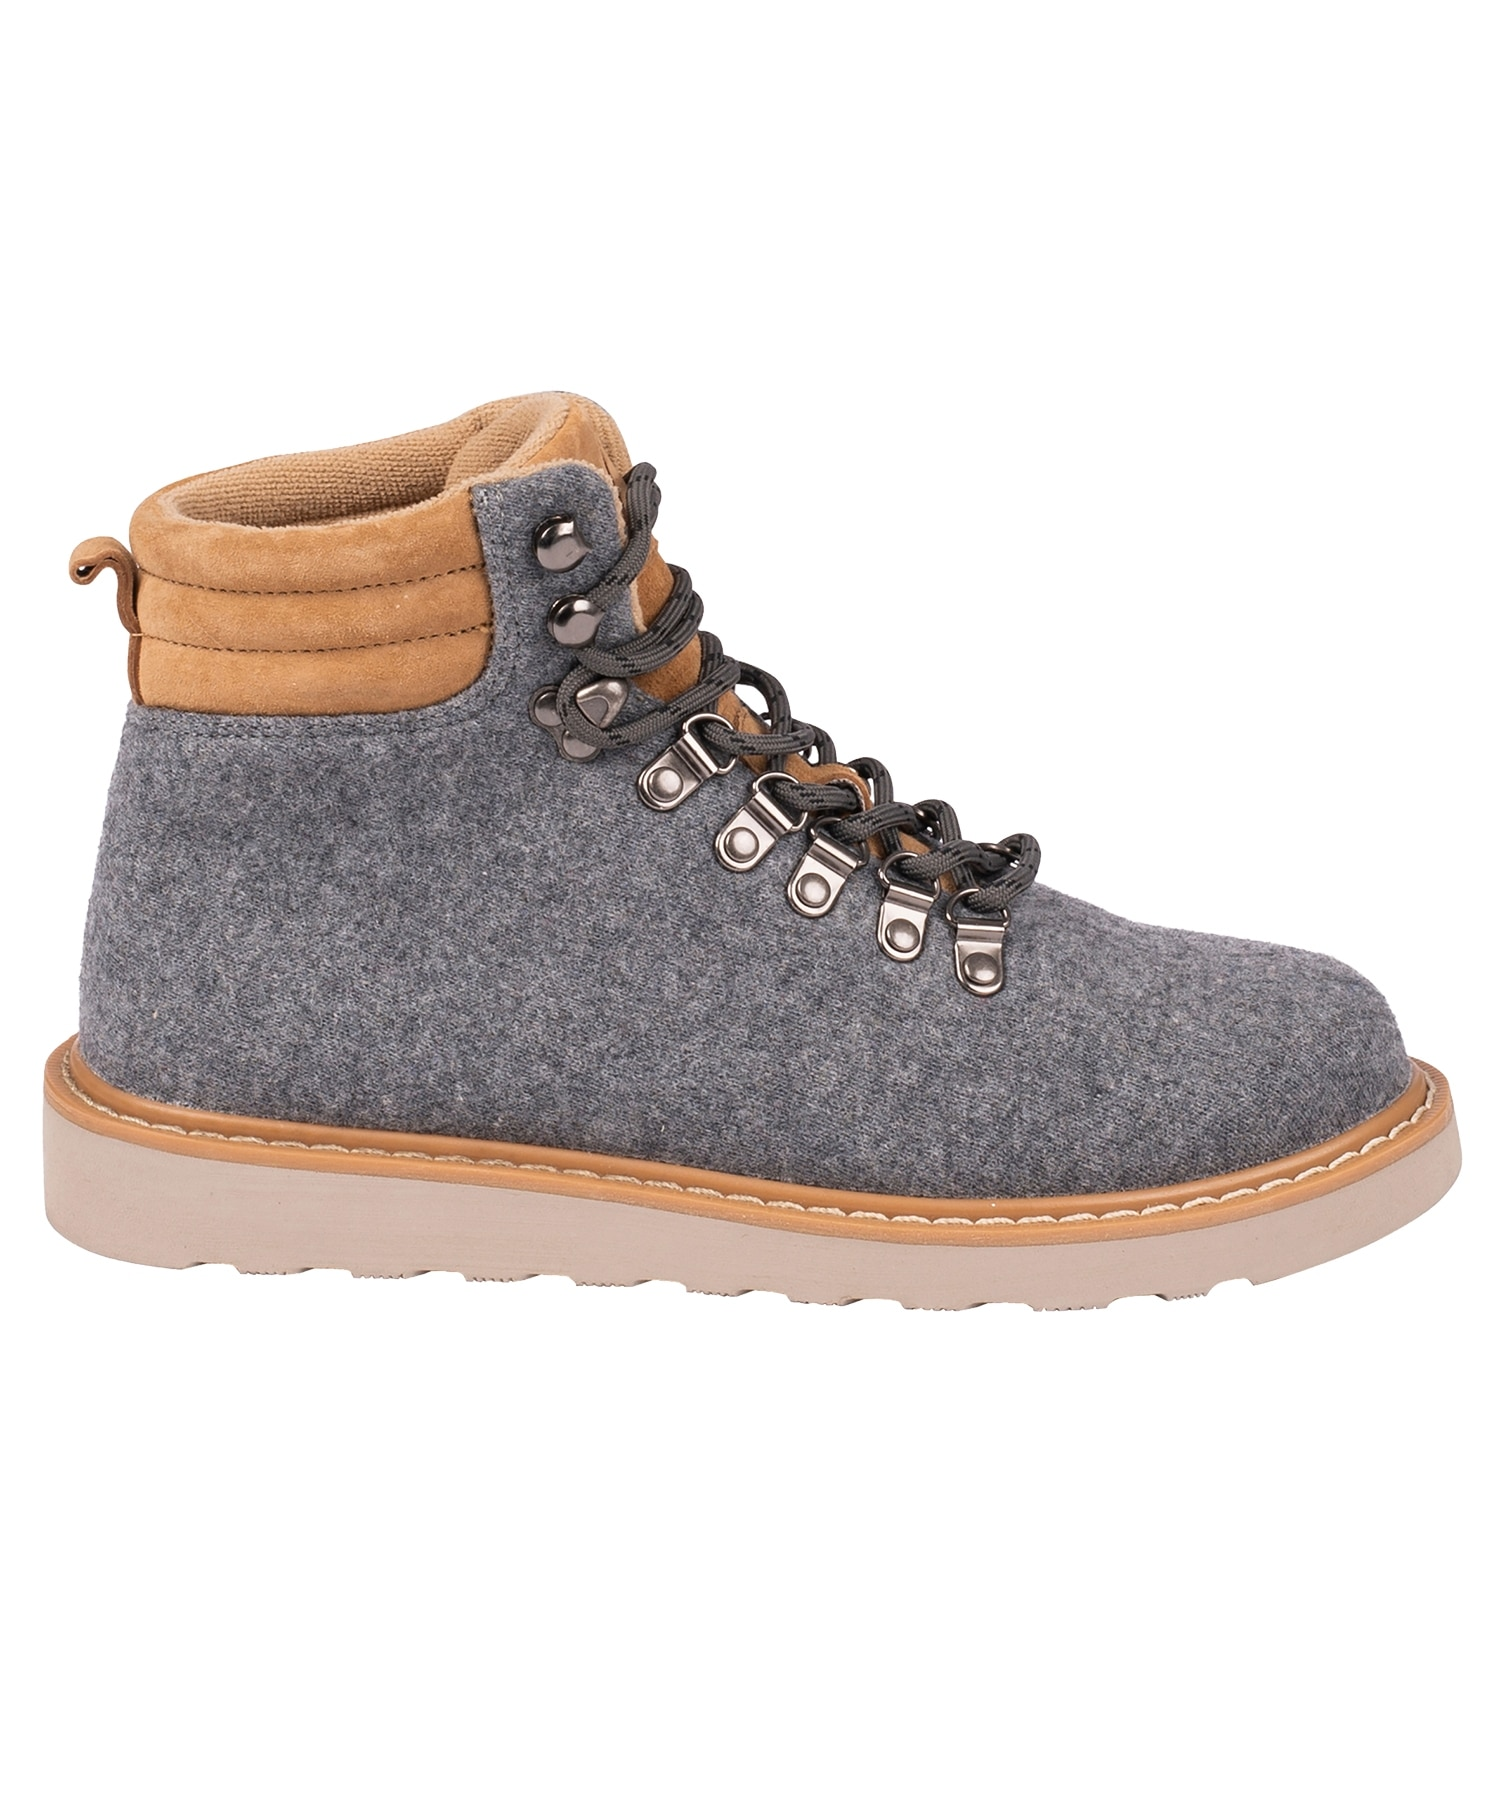 Twentyfour Kongsnut boot